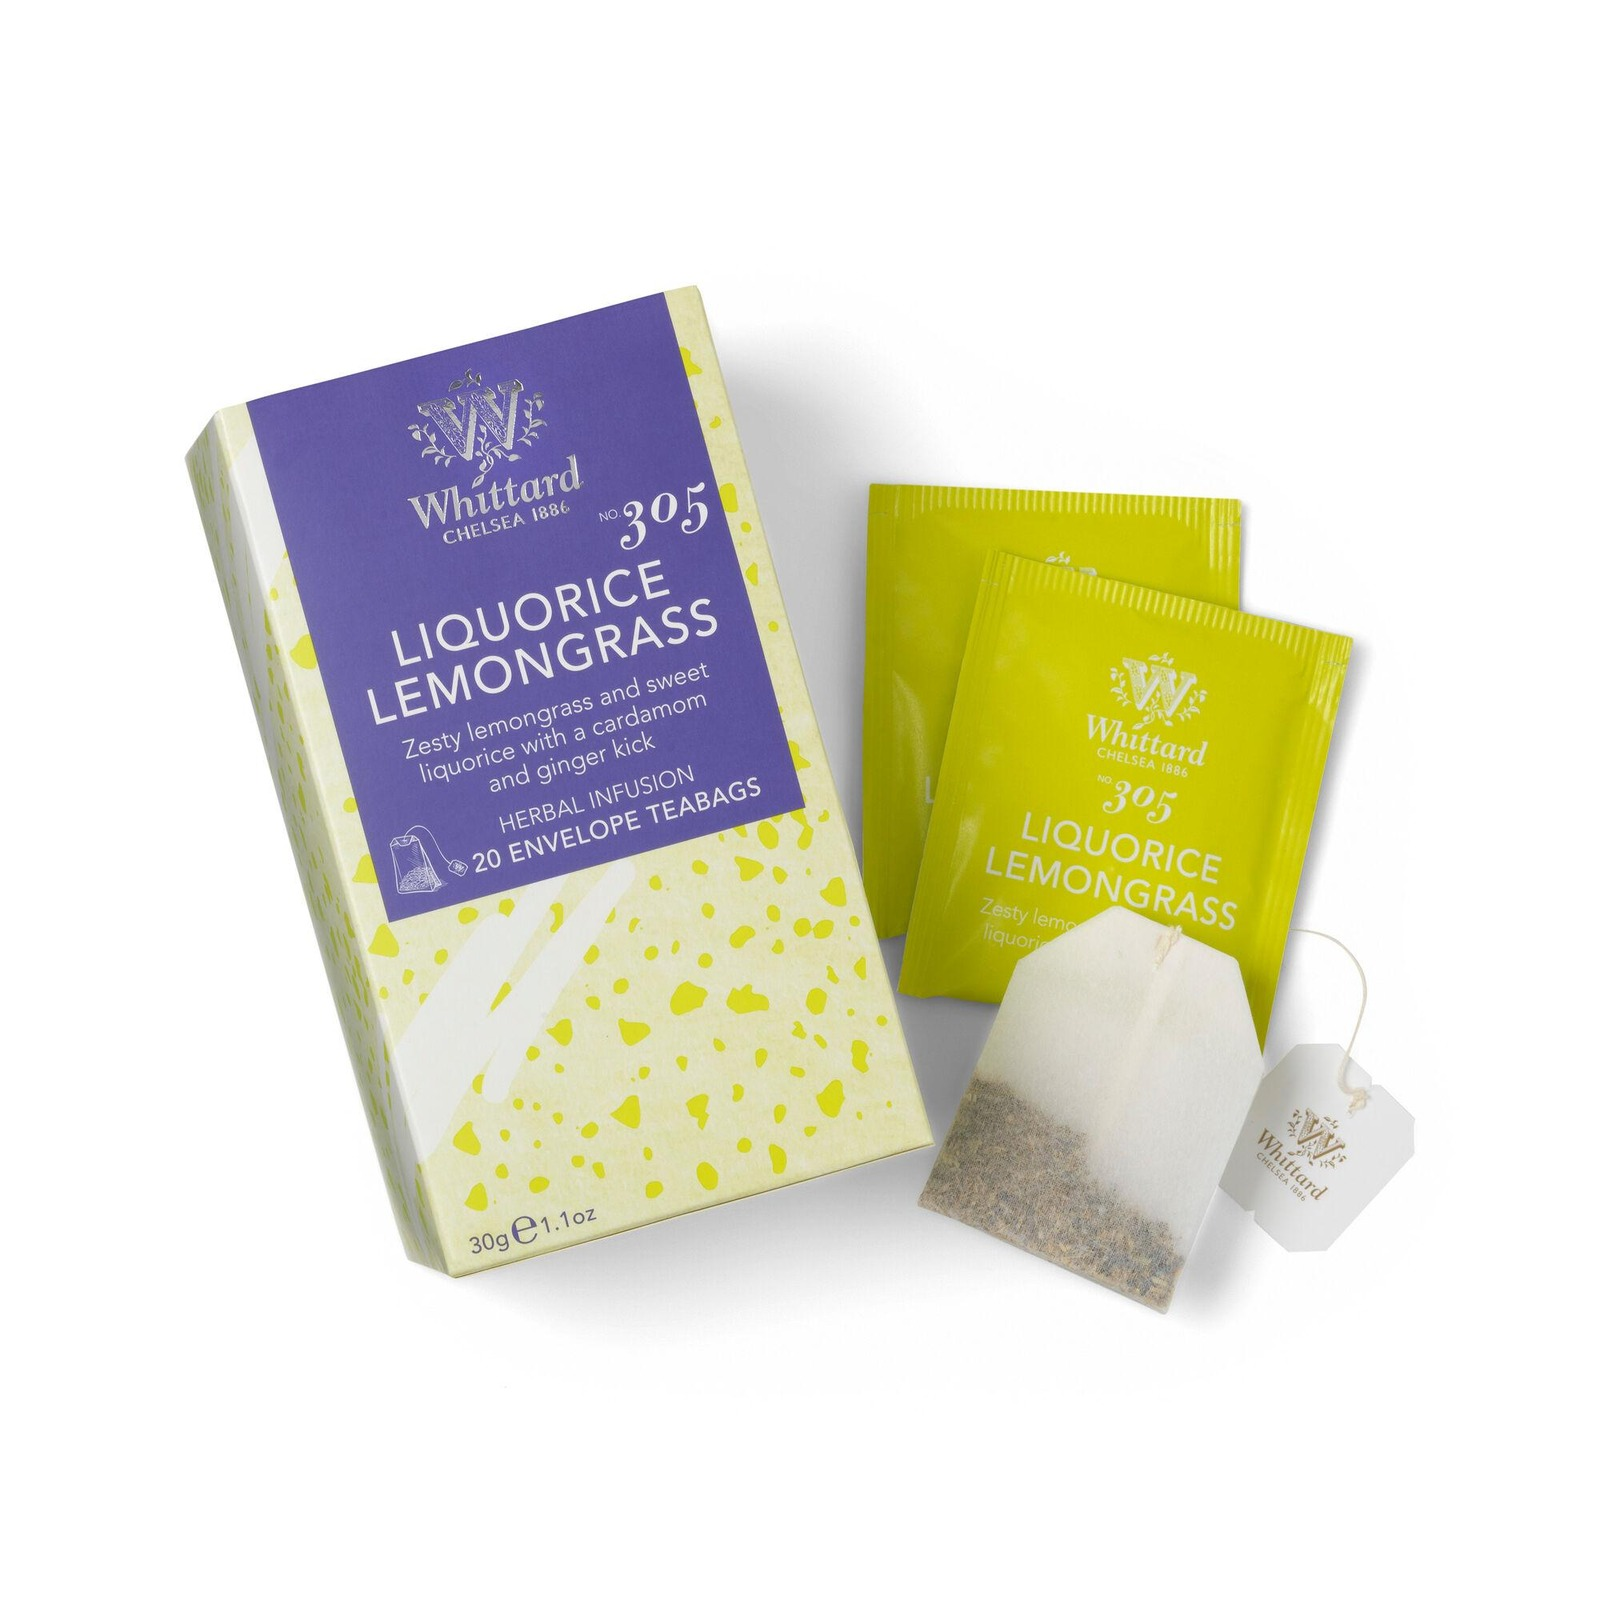 Whittard Liquorice Lemongrass 20 Individually Wrapped Teabags